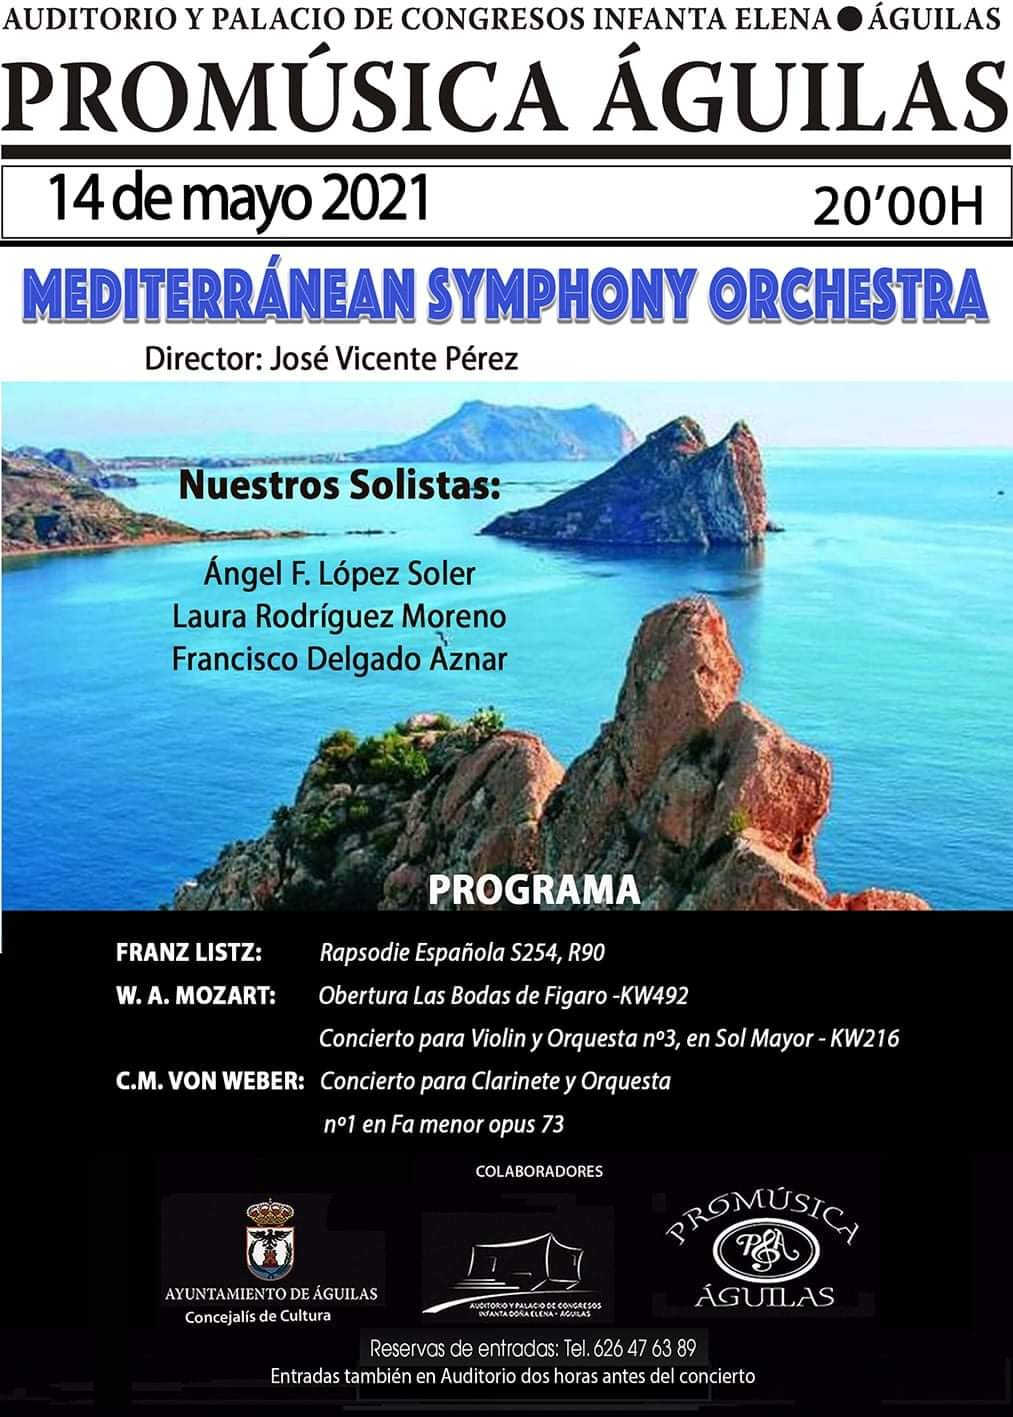 Promusica Águilas Mediterranean Symphony Orchestra